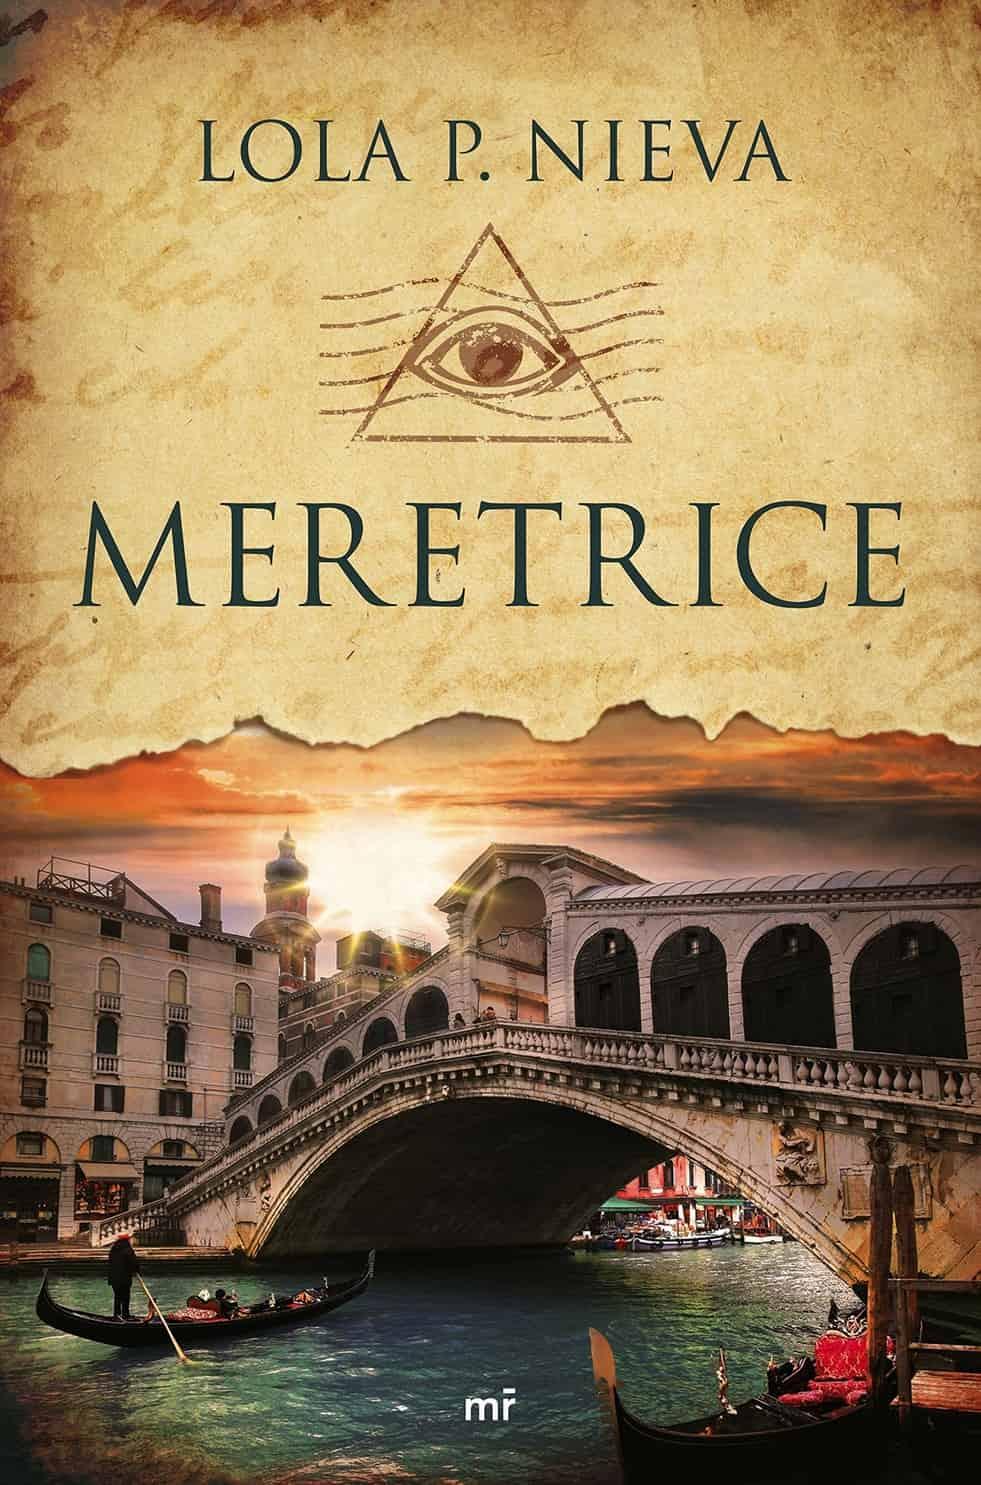 literatura erótica actual - Meretrice - Lola P. Nieva